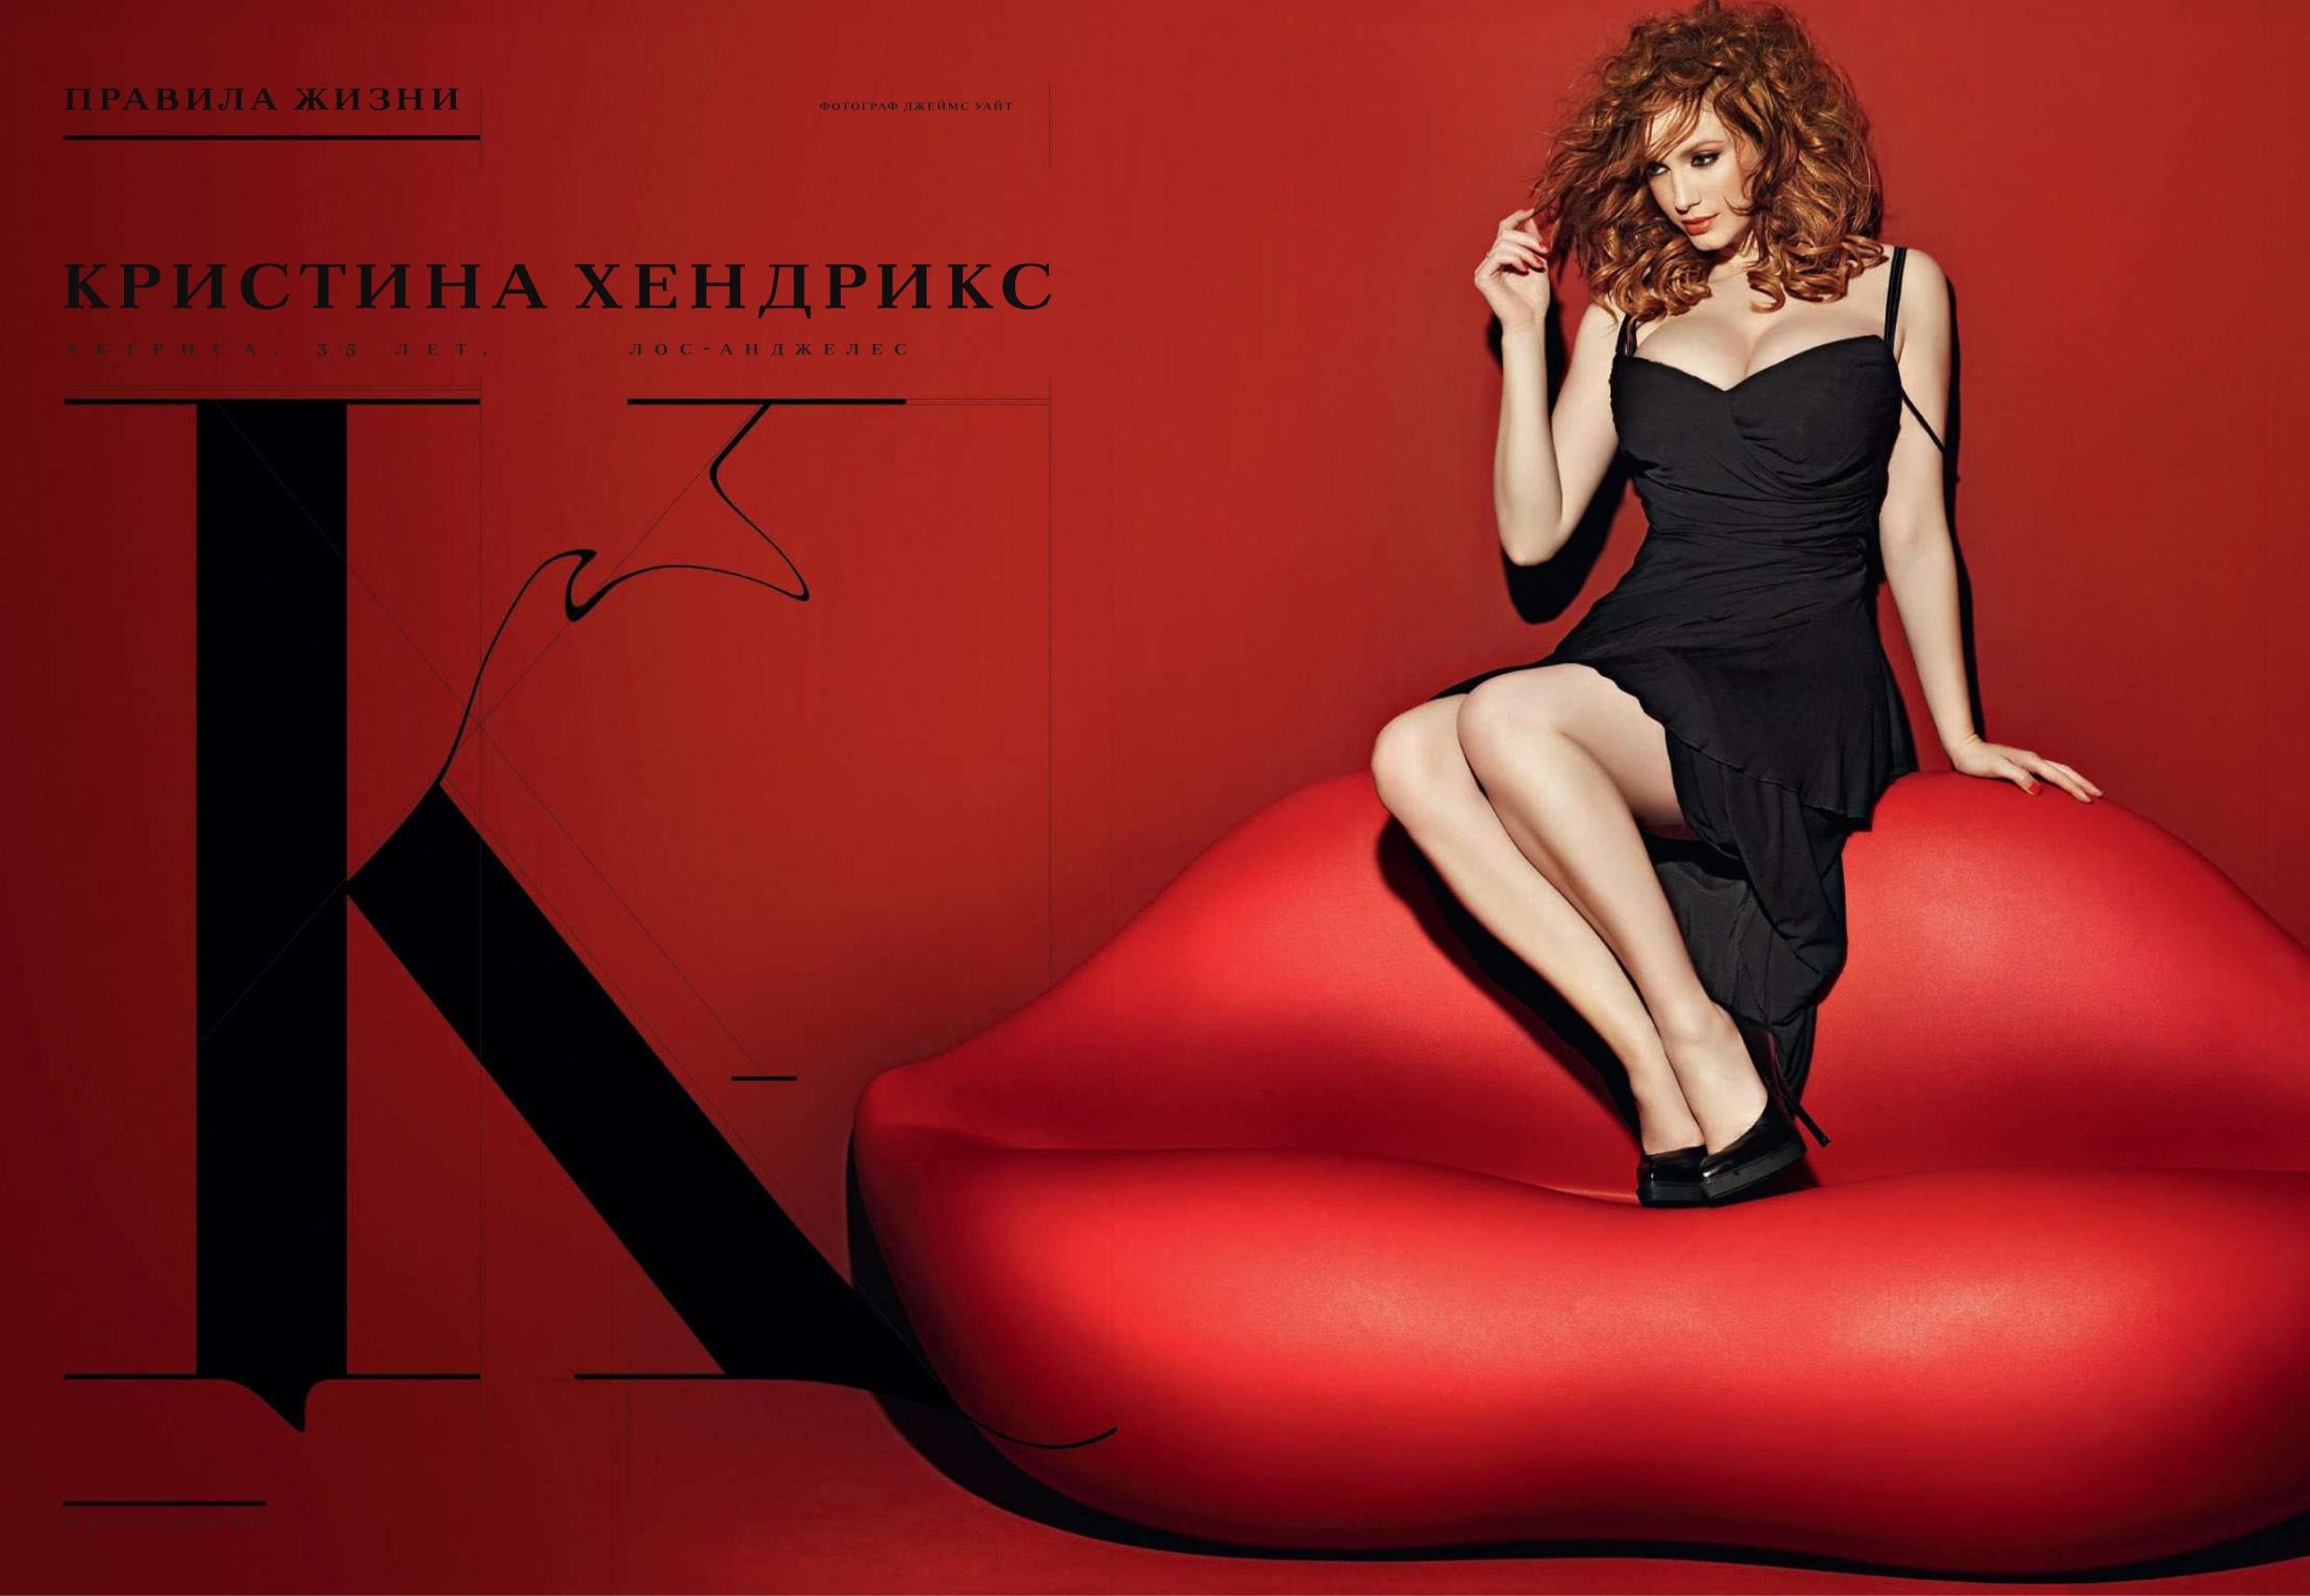 83904_septimiu29_ChristinaHendricks_EsquireRussia_June2010_122_223lo.jpg